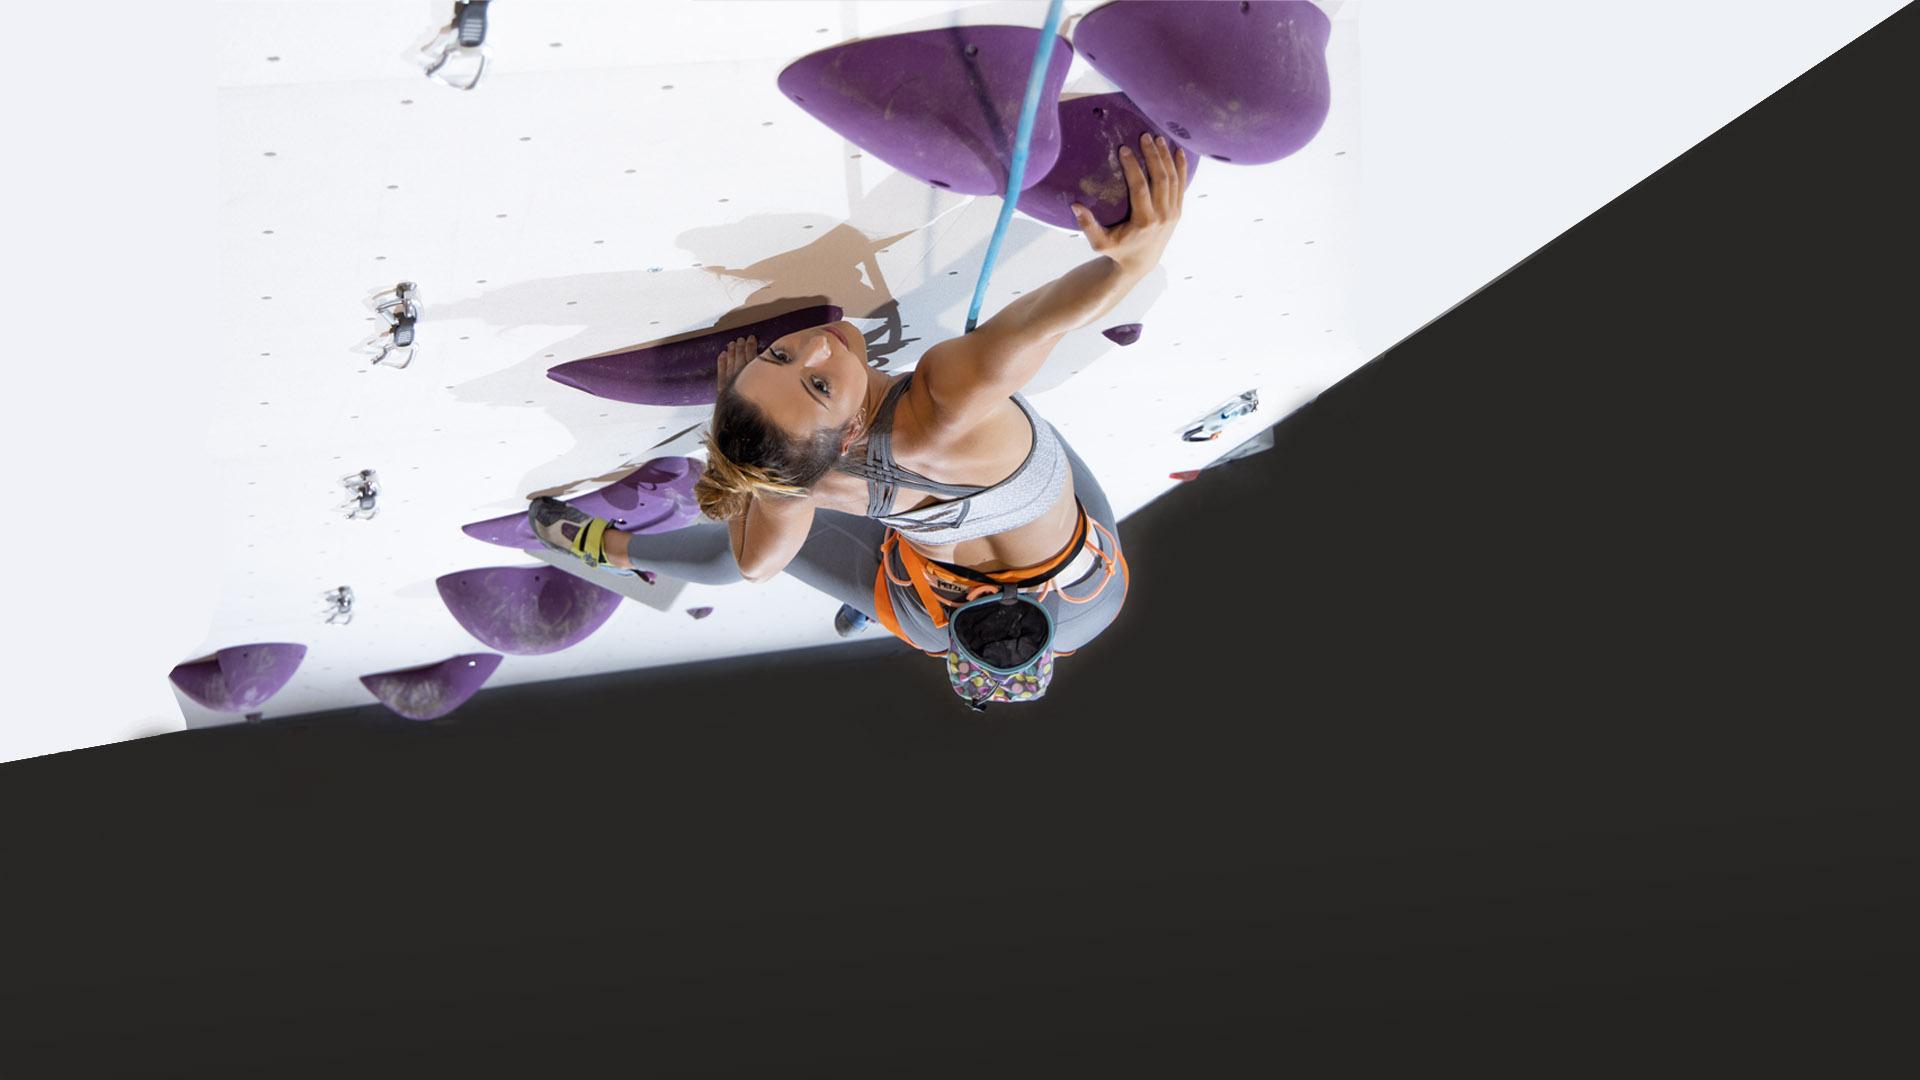 Salles d'escalade du réseau Climb Up